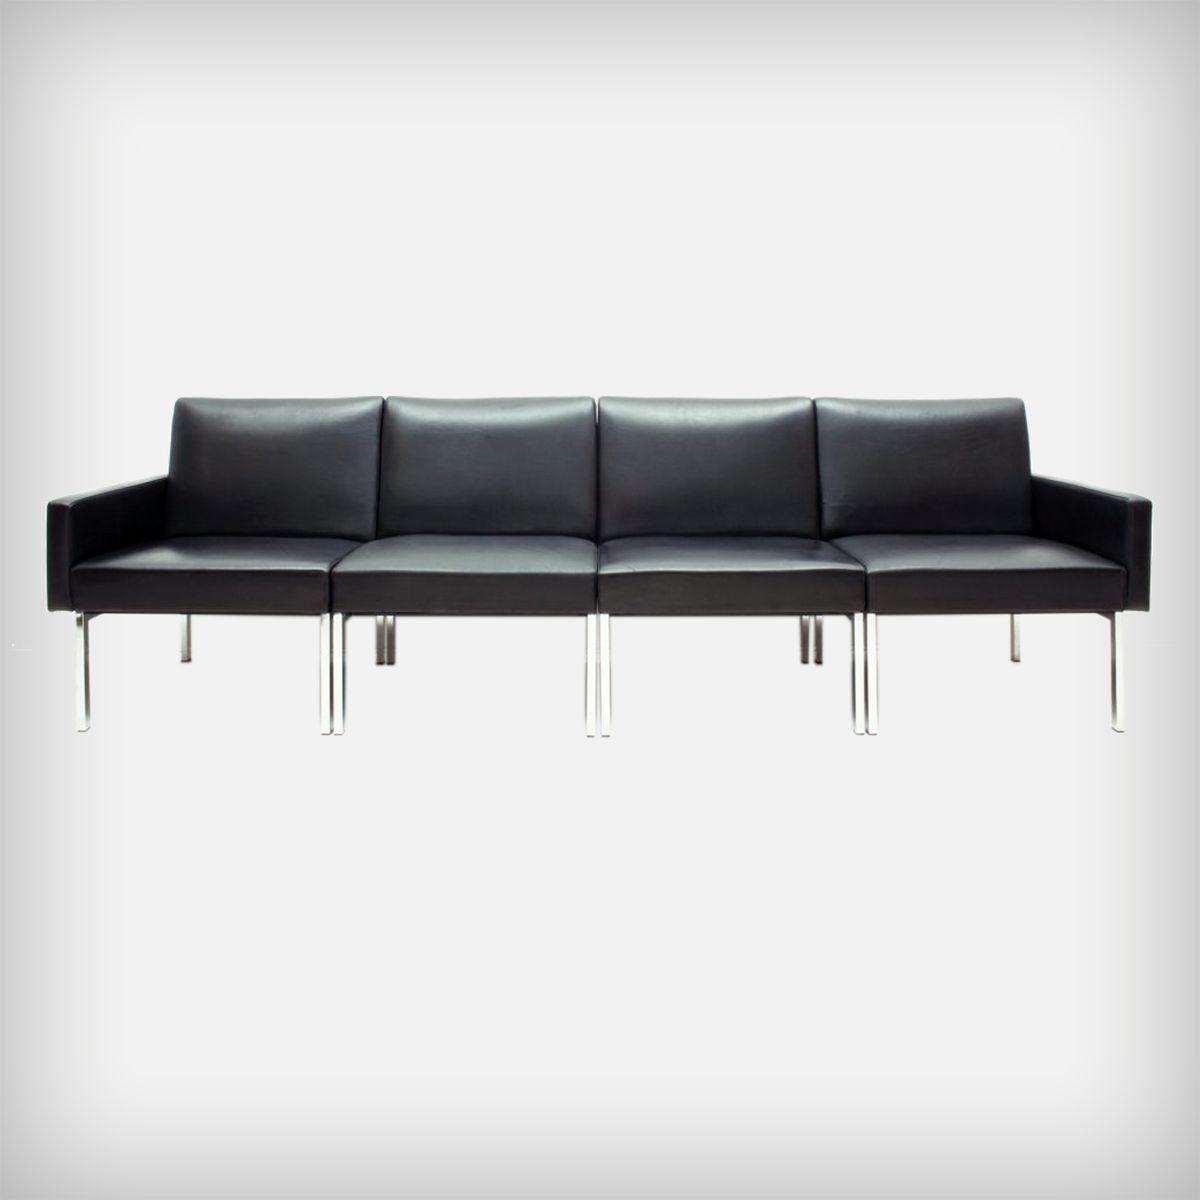 modulares sofa aus schwarzem leder chrom 1970er bei pamono kaufen. Black Bedroom Furniture Sets. Home Design Ideas